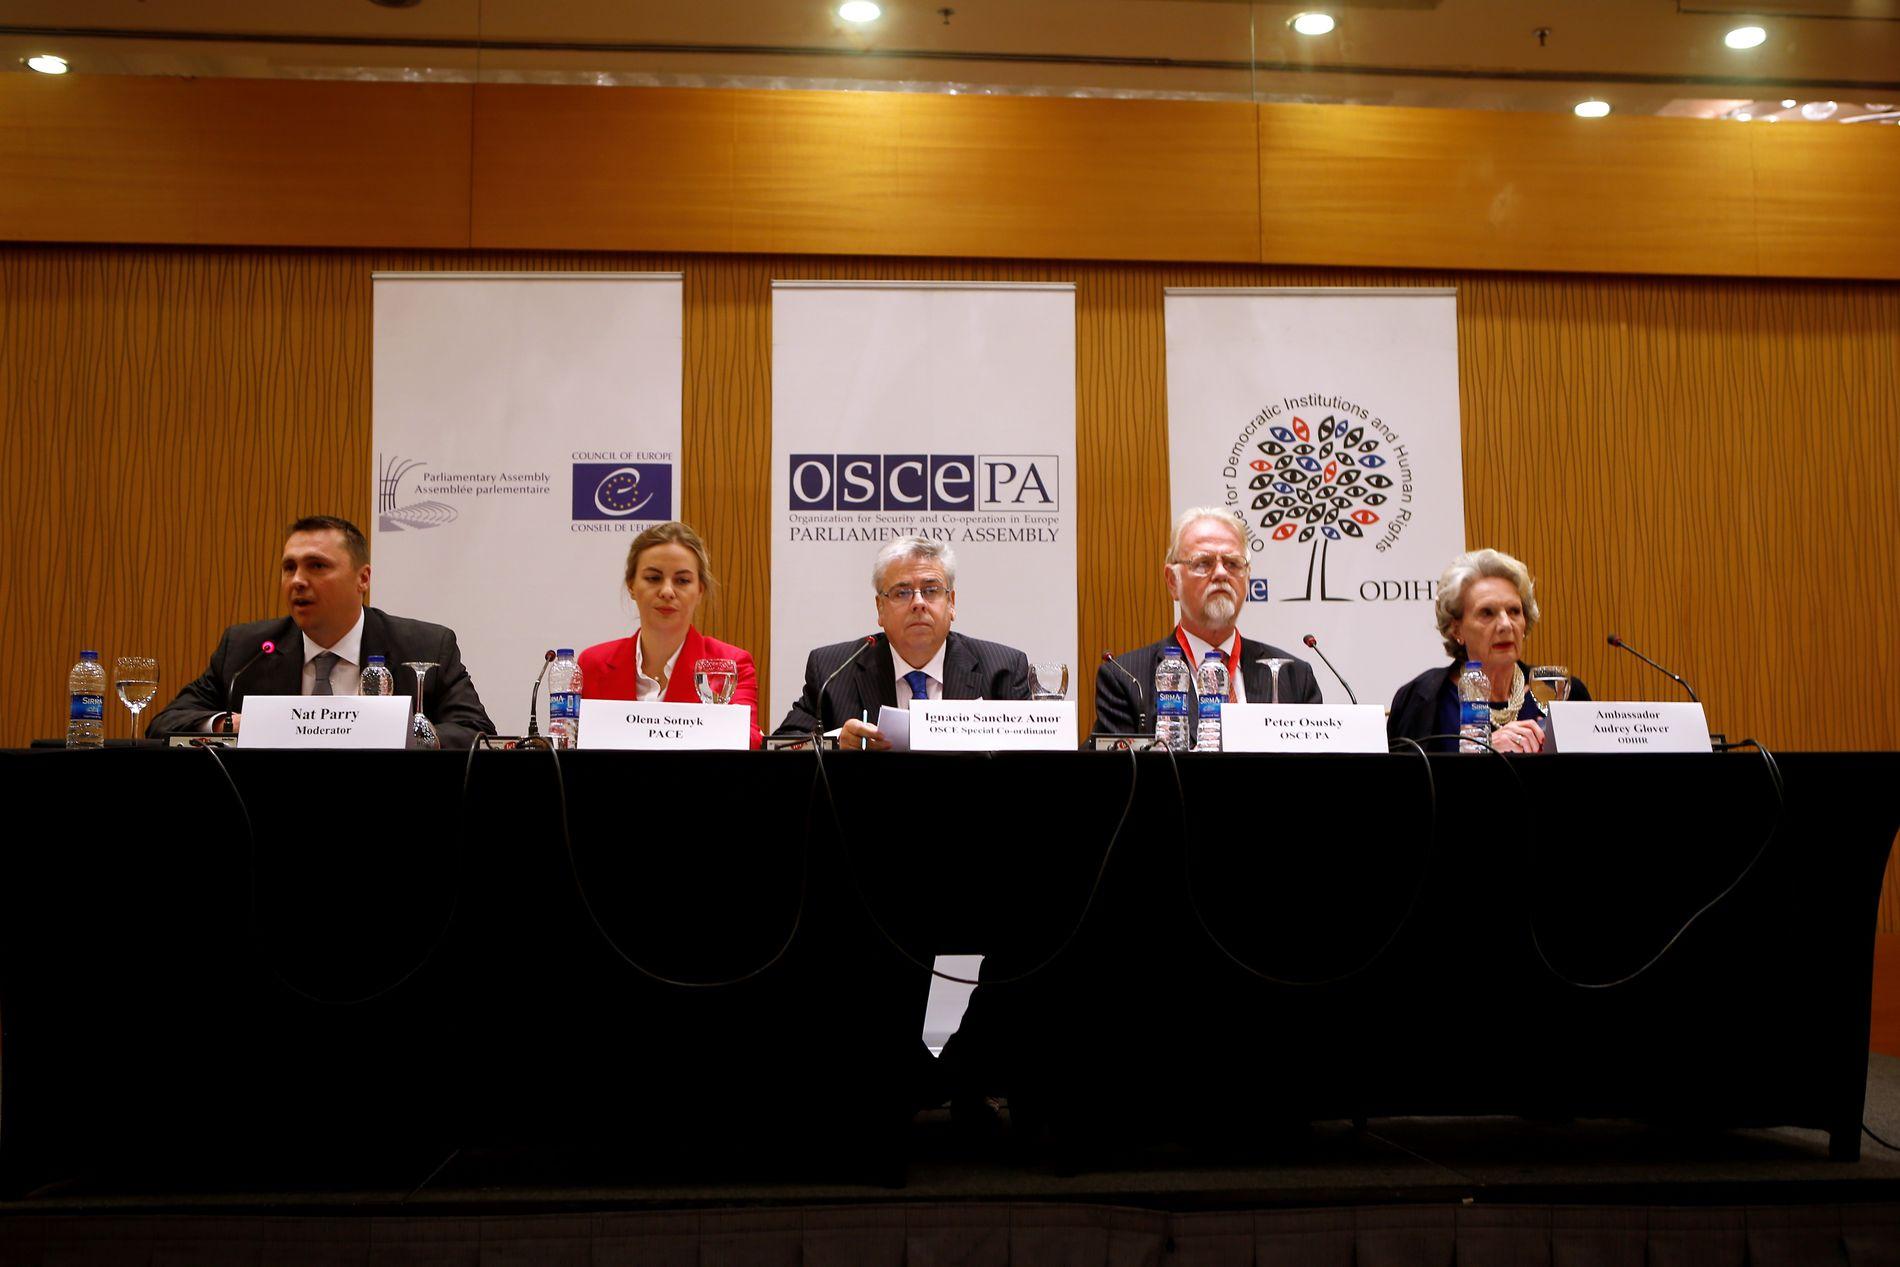 OVERVÅKET VALGET: Representanter fra OSSE og Europarådets parlamentarikerforsamling la frem en krass rapport om Tyrkia-valget under en pressekonferanse i Ankara mandag.